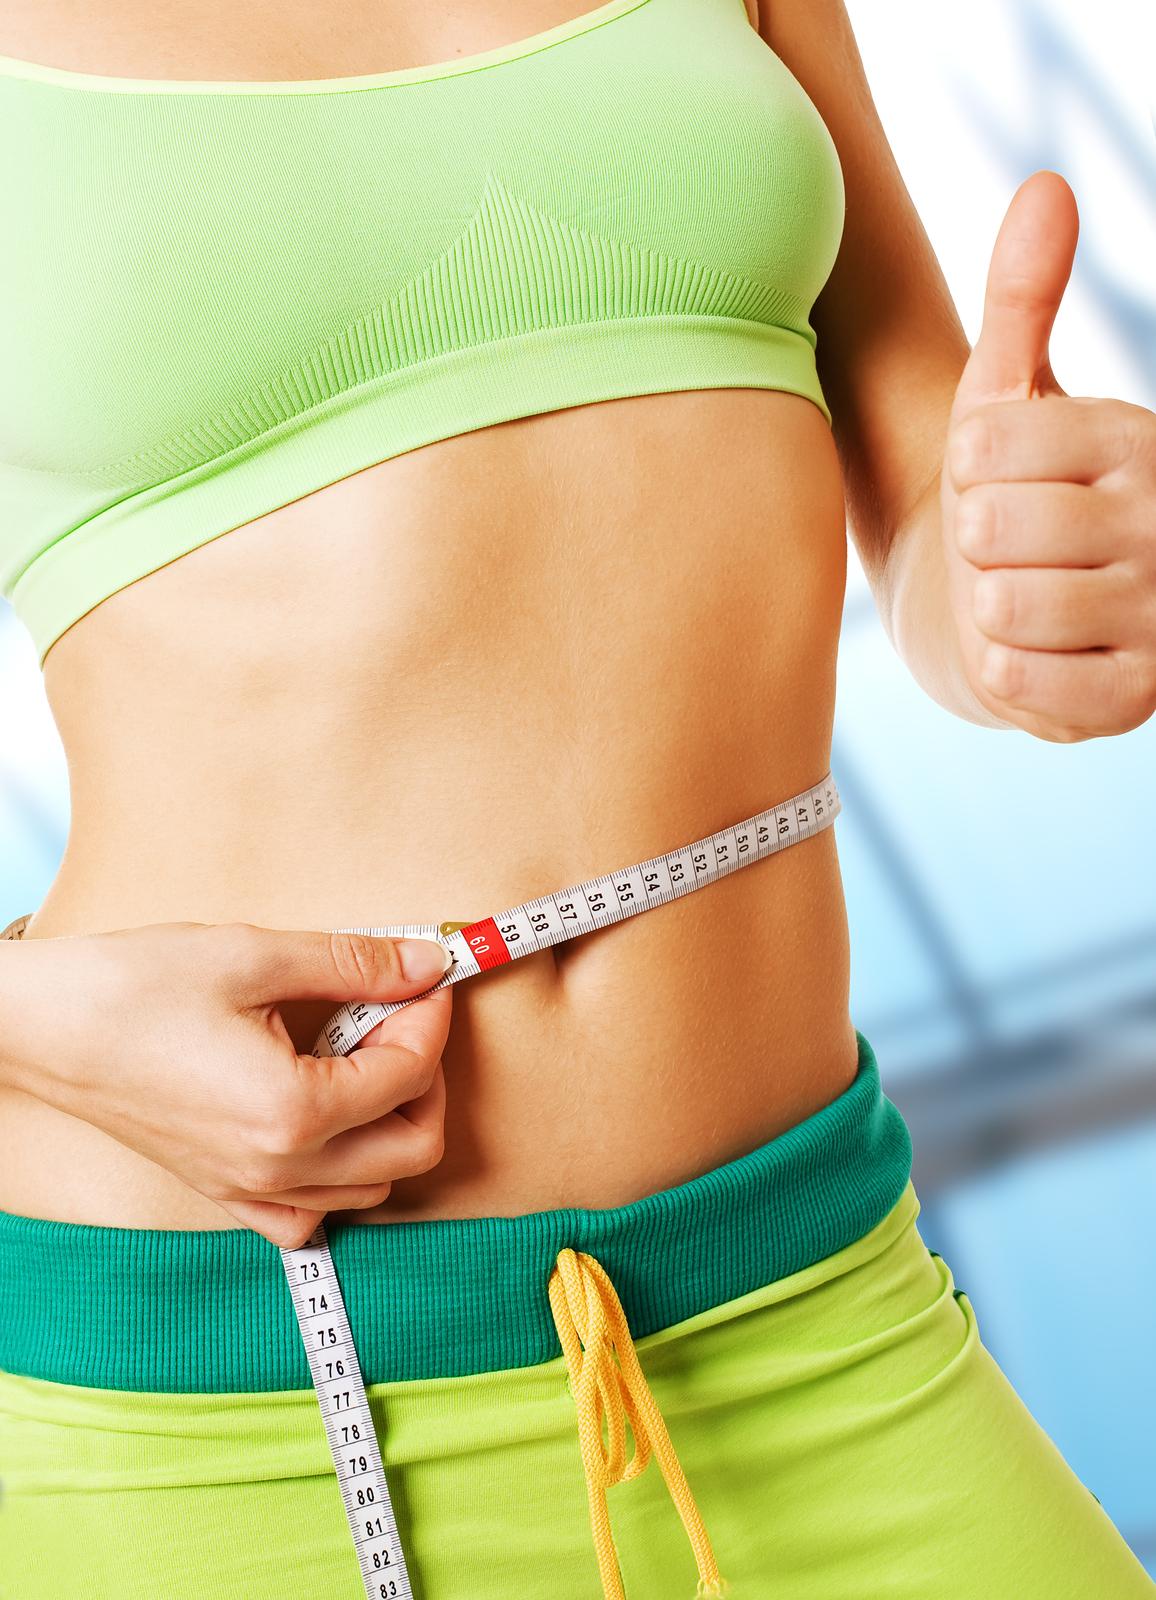 Фото анал схуднення 21 фотография